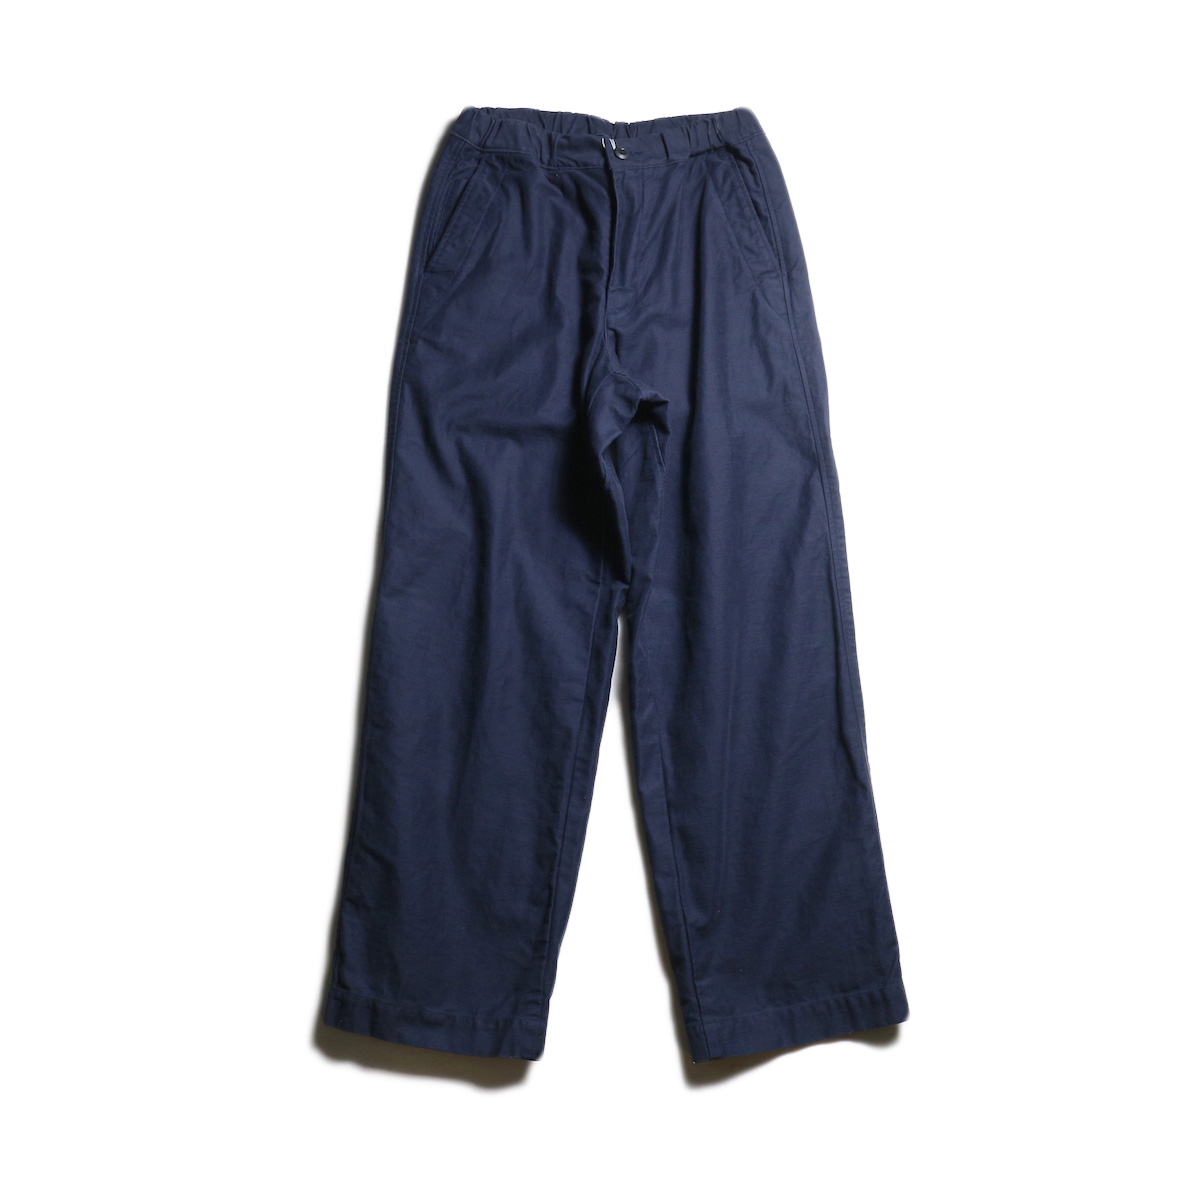 BRENA / Coq Pants (Navy)